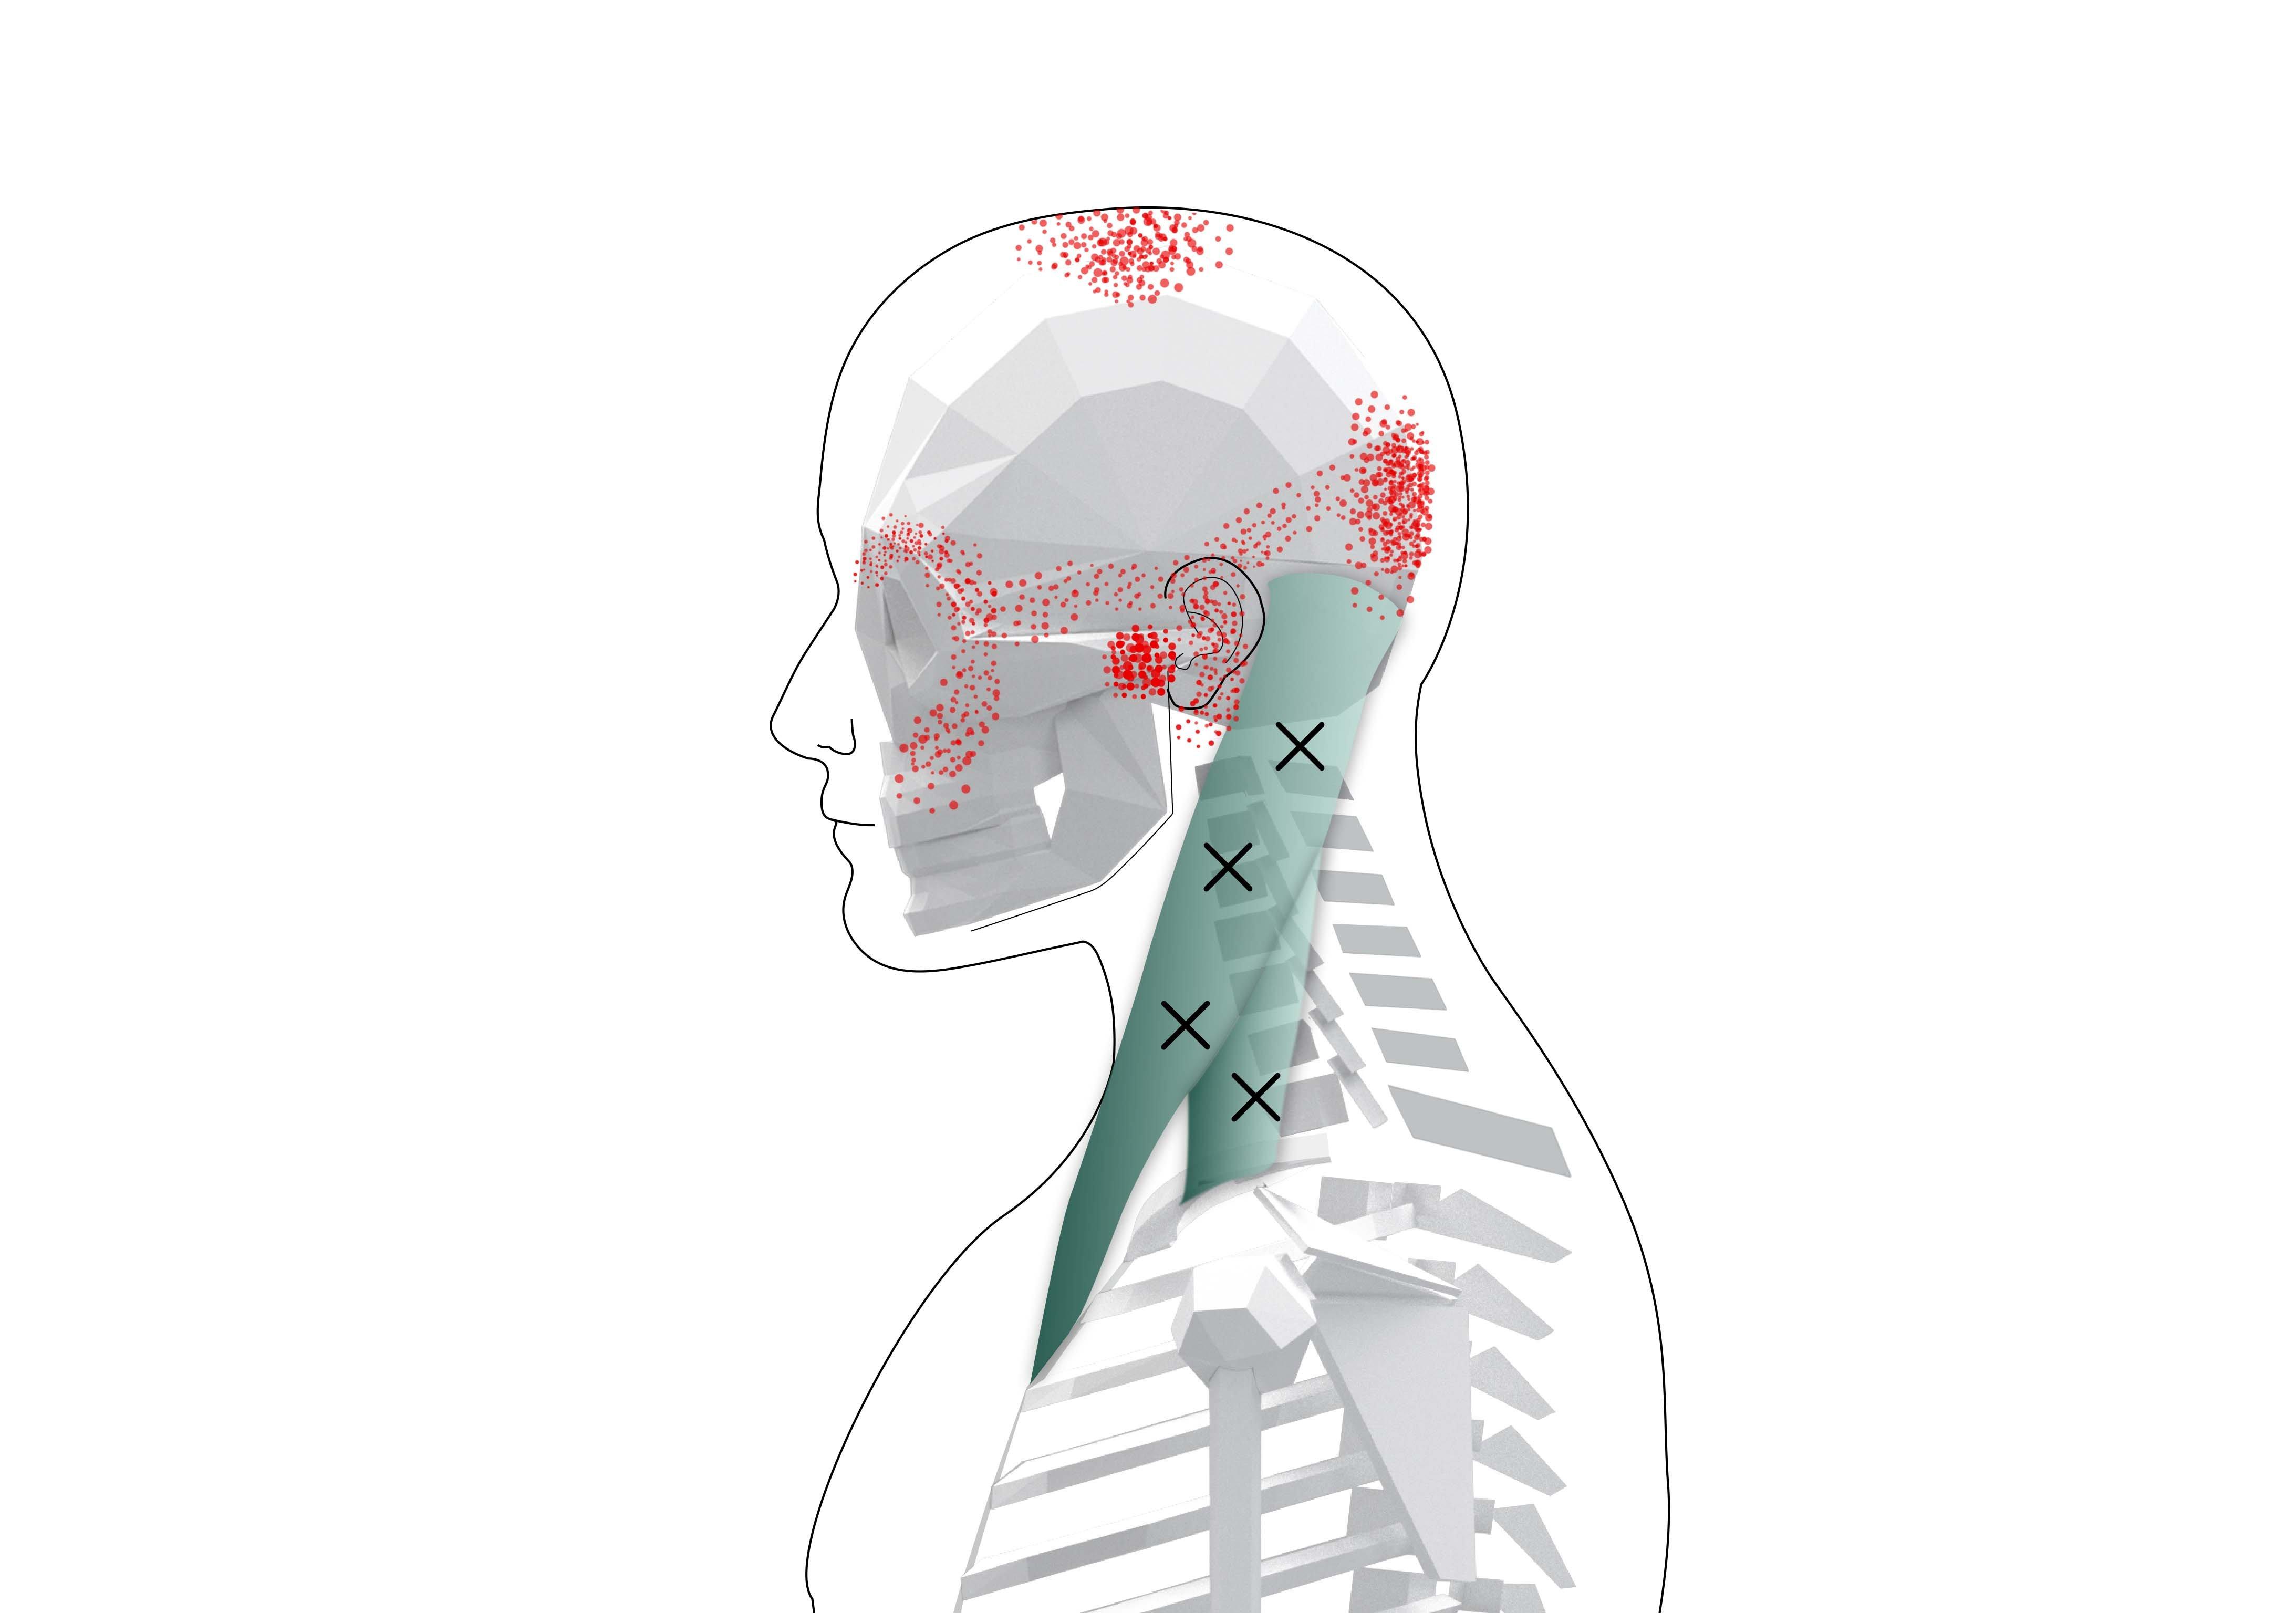 Sternocleidomastoid Trigger Points